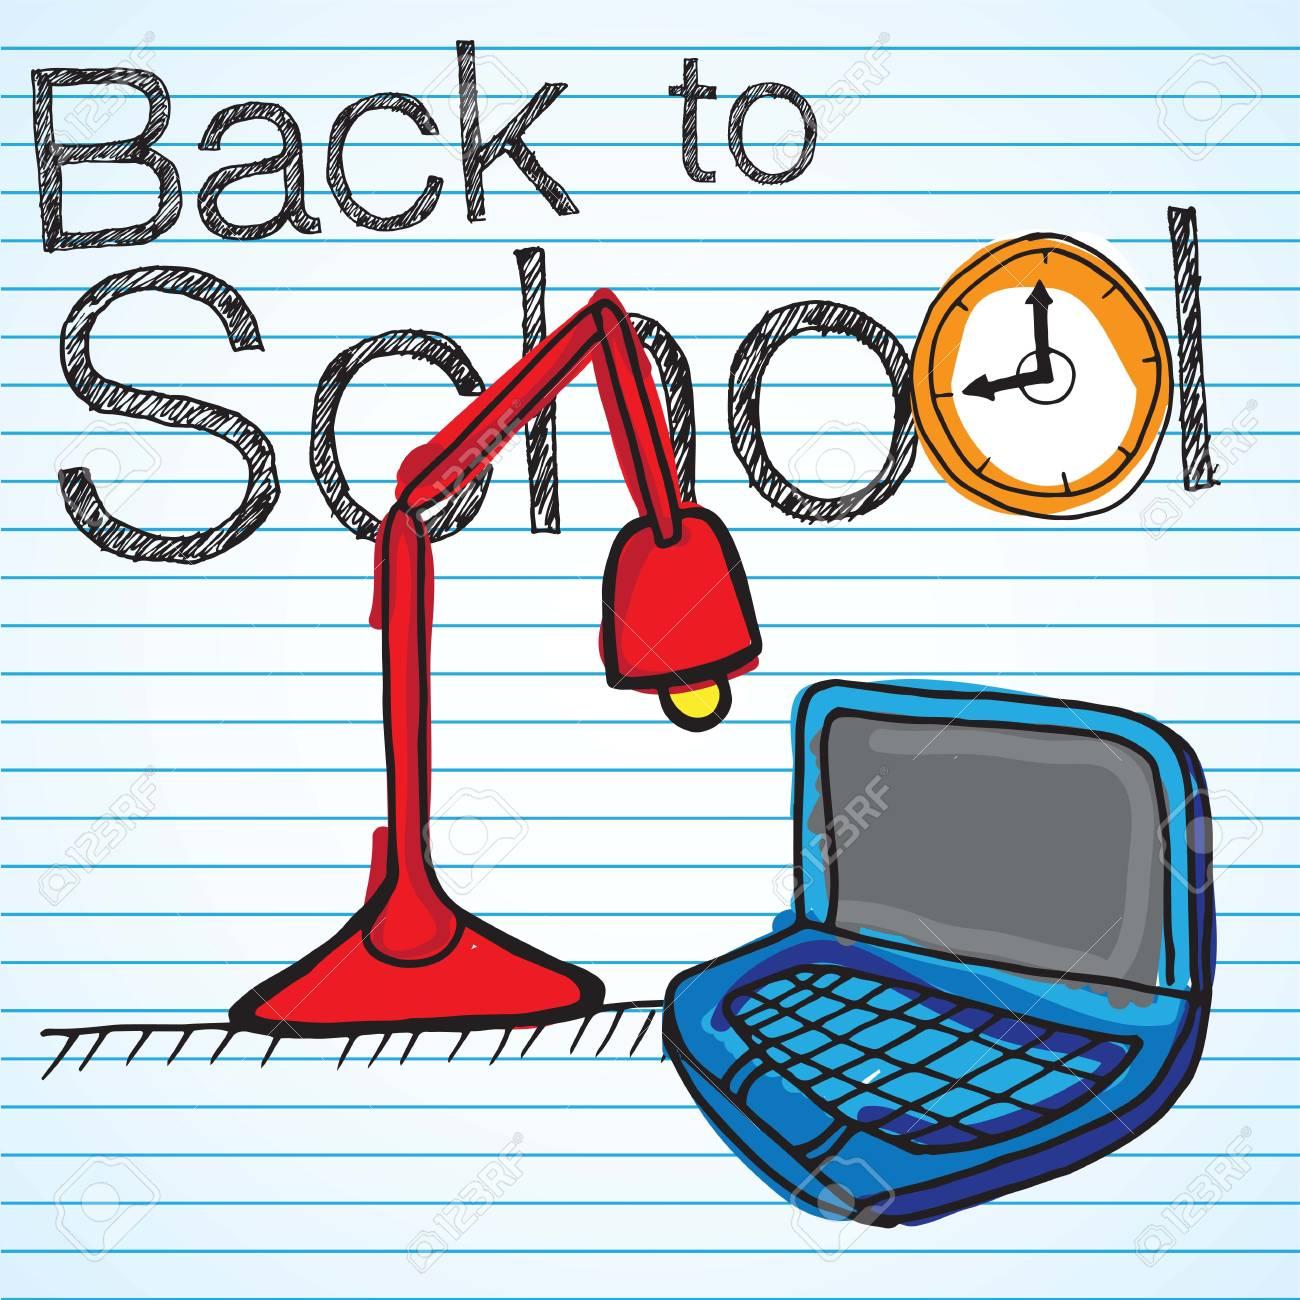 desktop items. Back to school icons. Vector illustration Stock Vector - 17350744